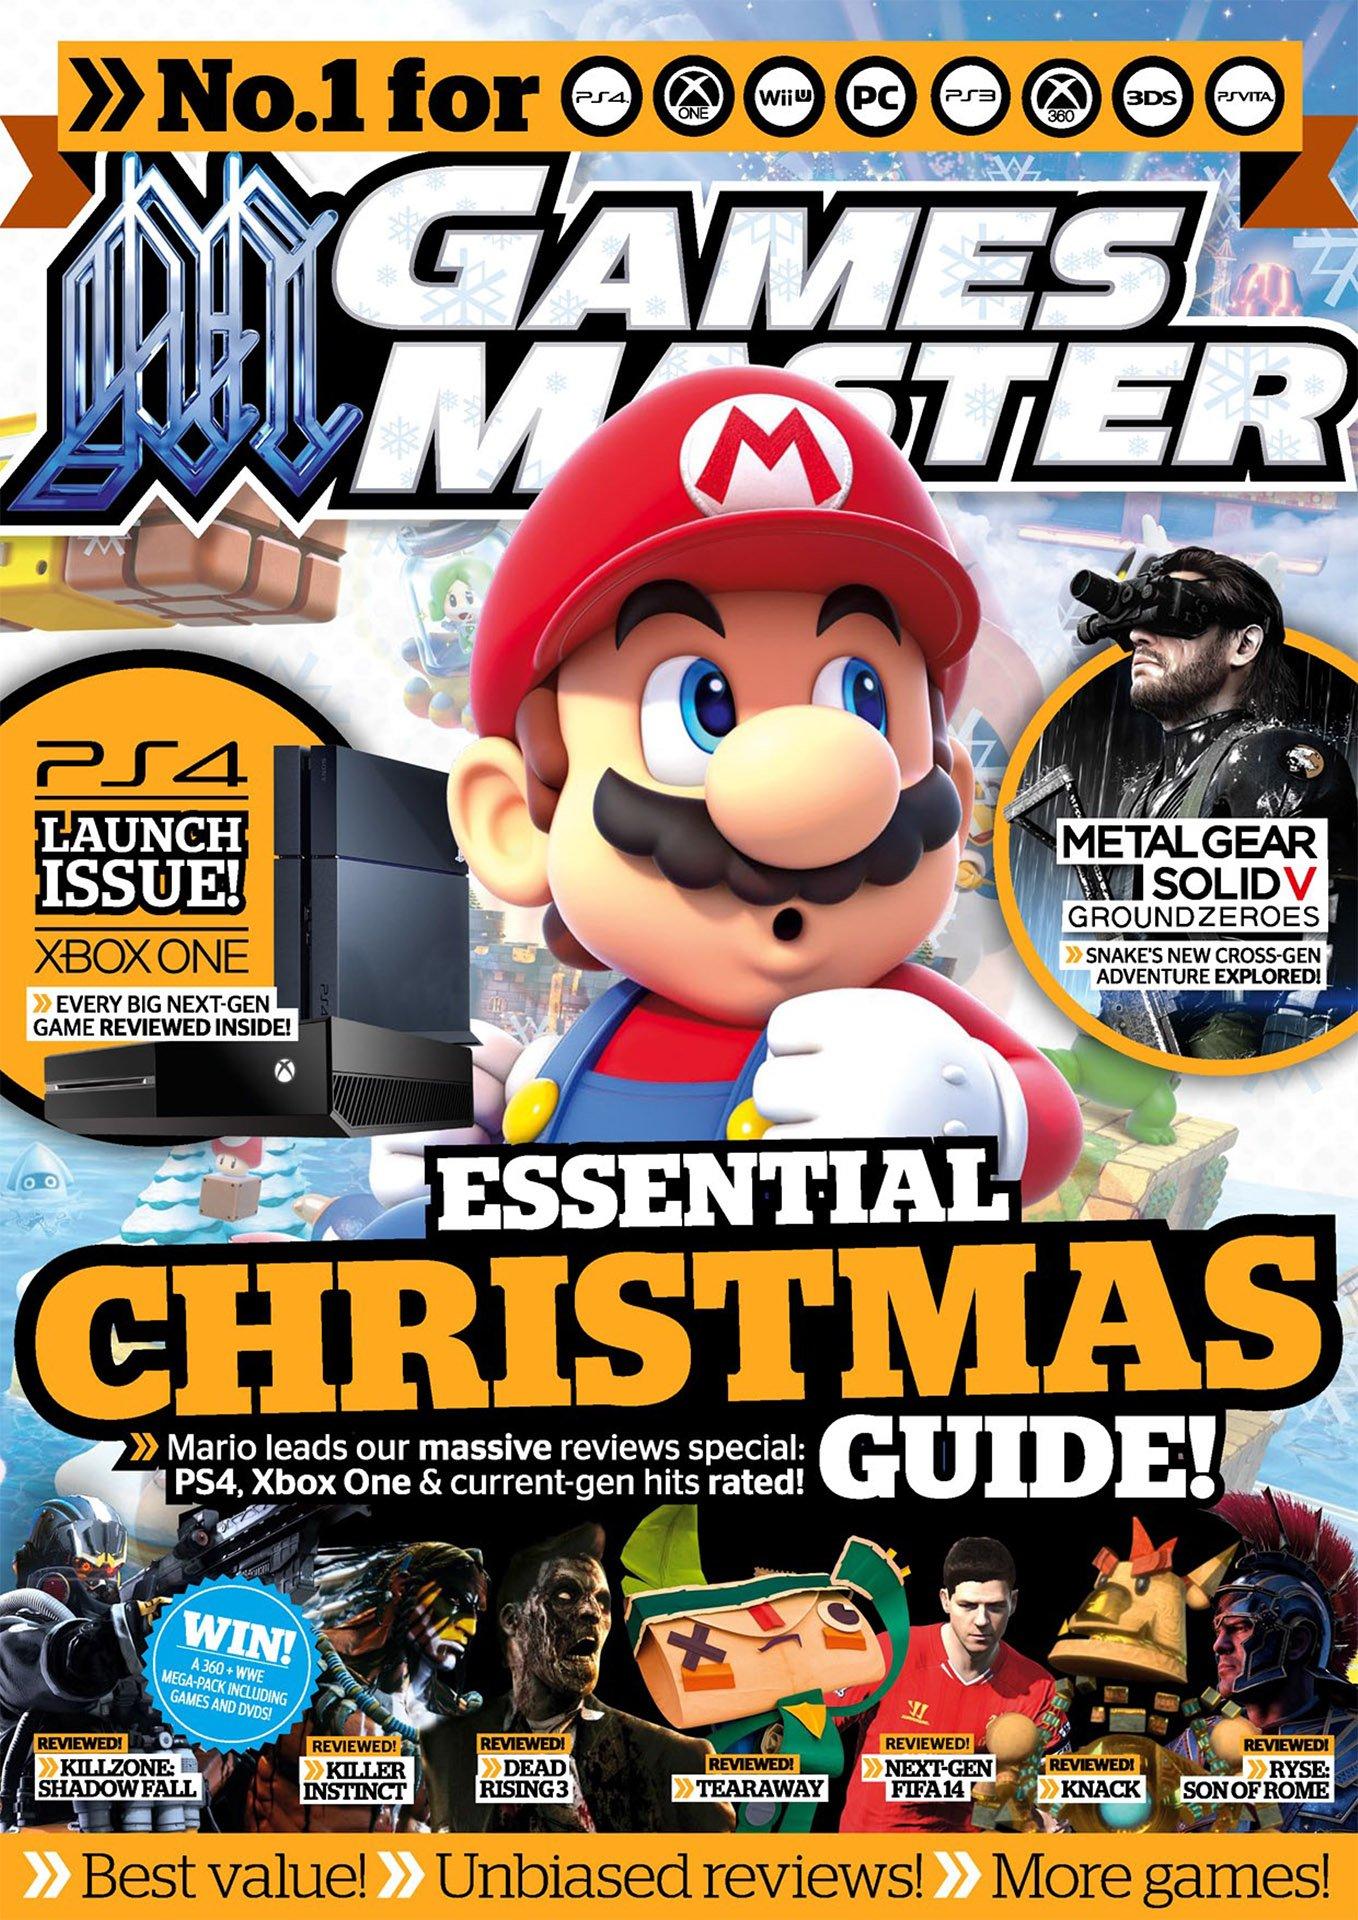 GamesMaster Issue 272 (January 2014) (digital edition)